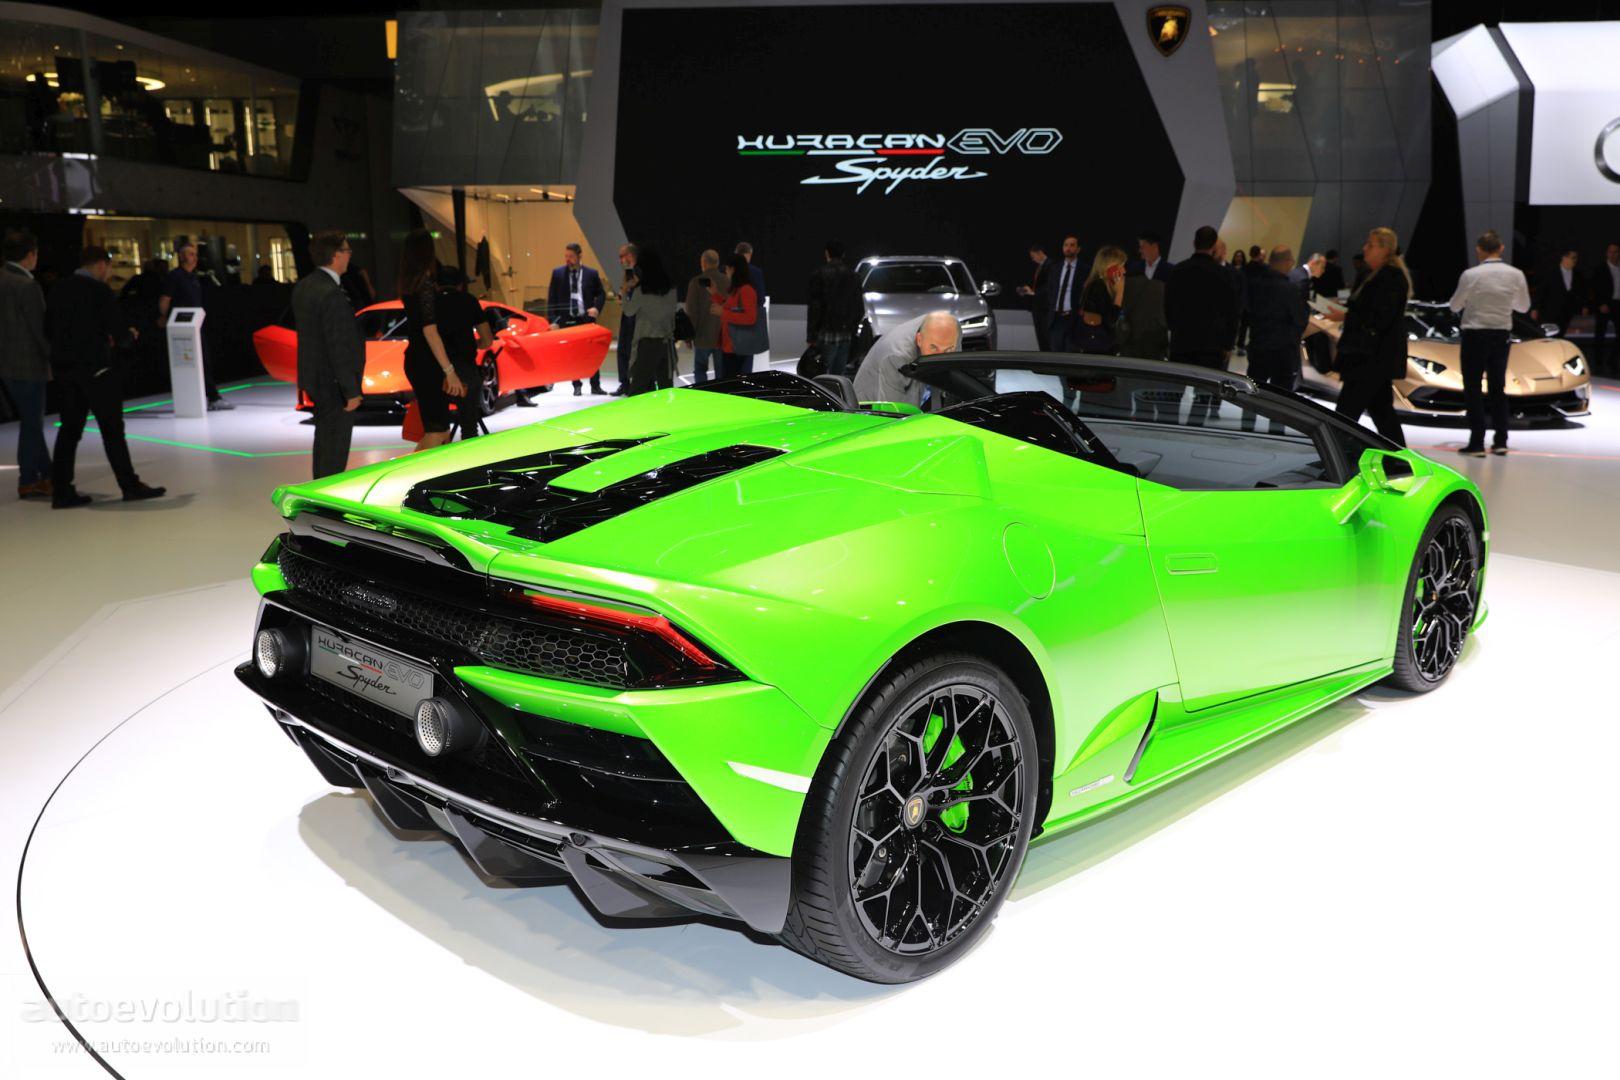 Lamborghini Huracan Evo Spyder Shows Up In German Traffic